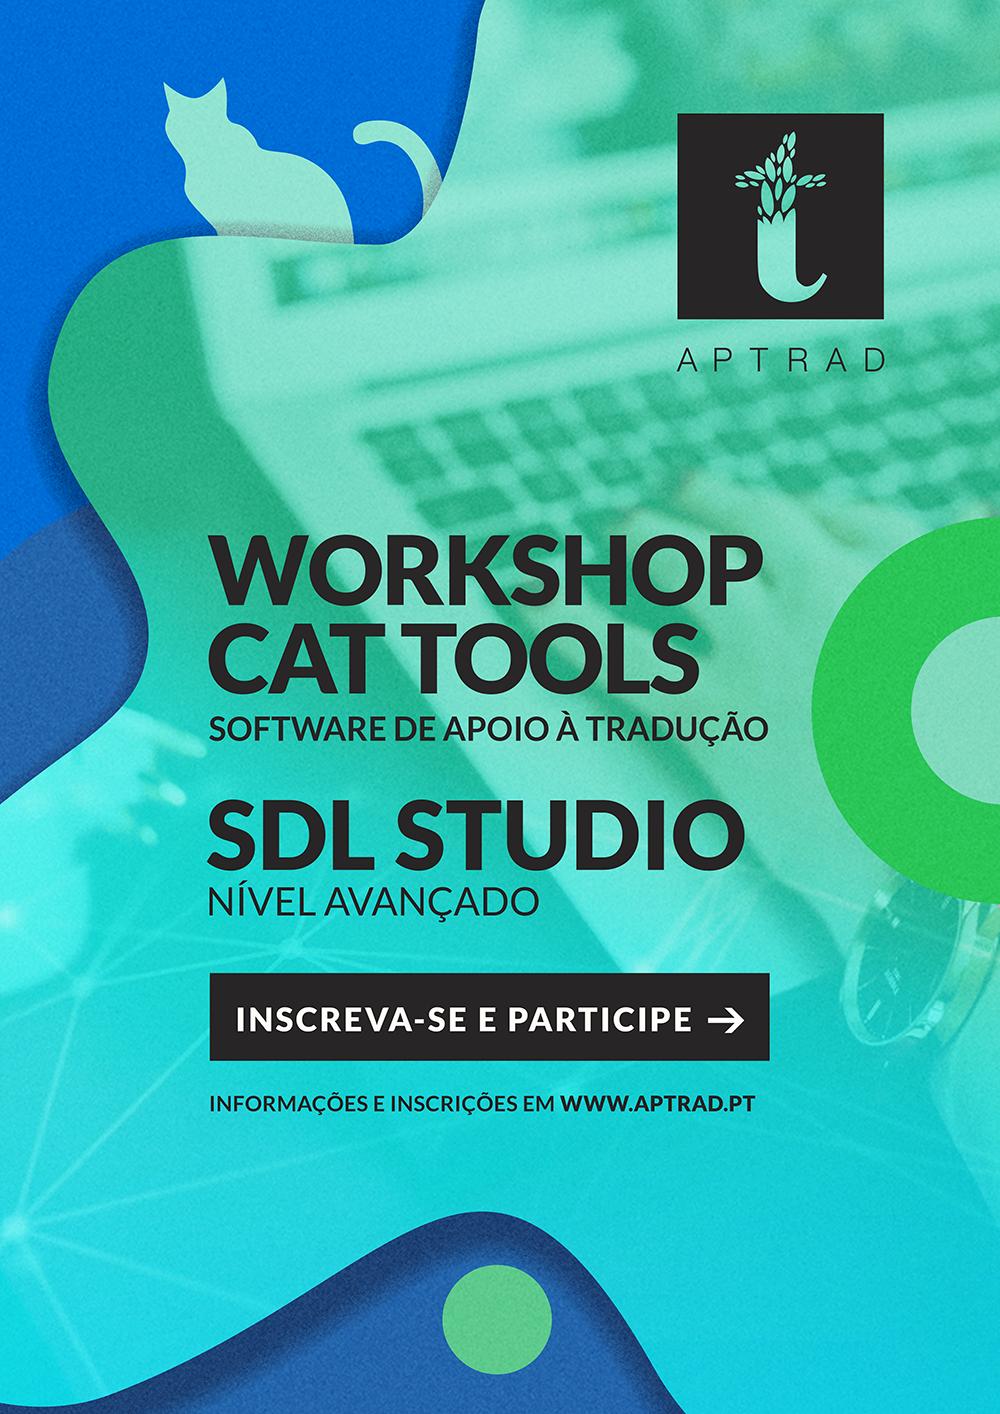 Workshop CAT Tools – SDL Studio [Nível Avançado]